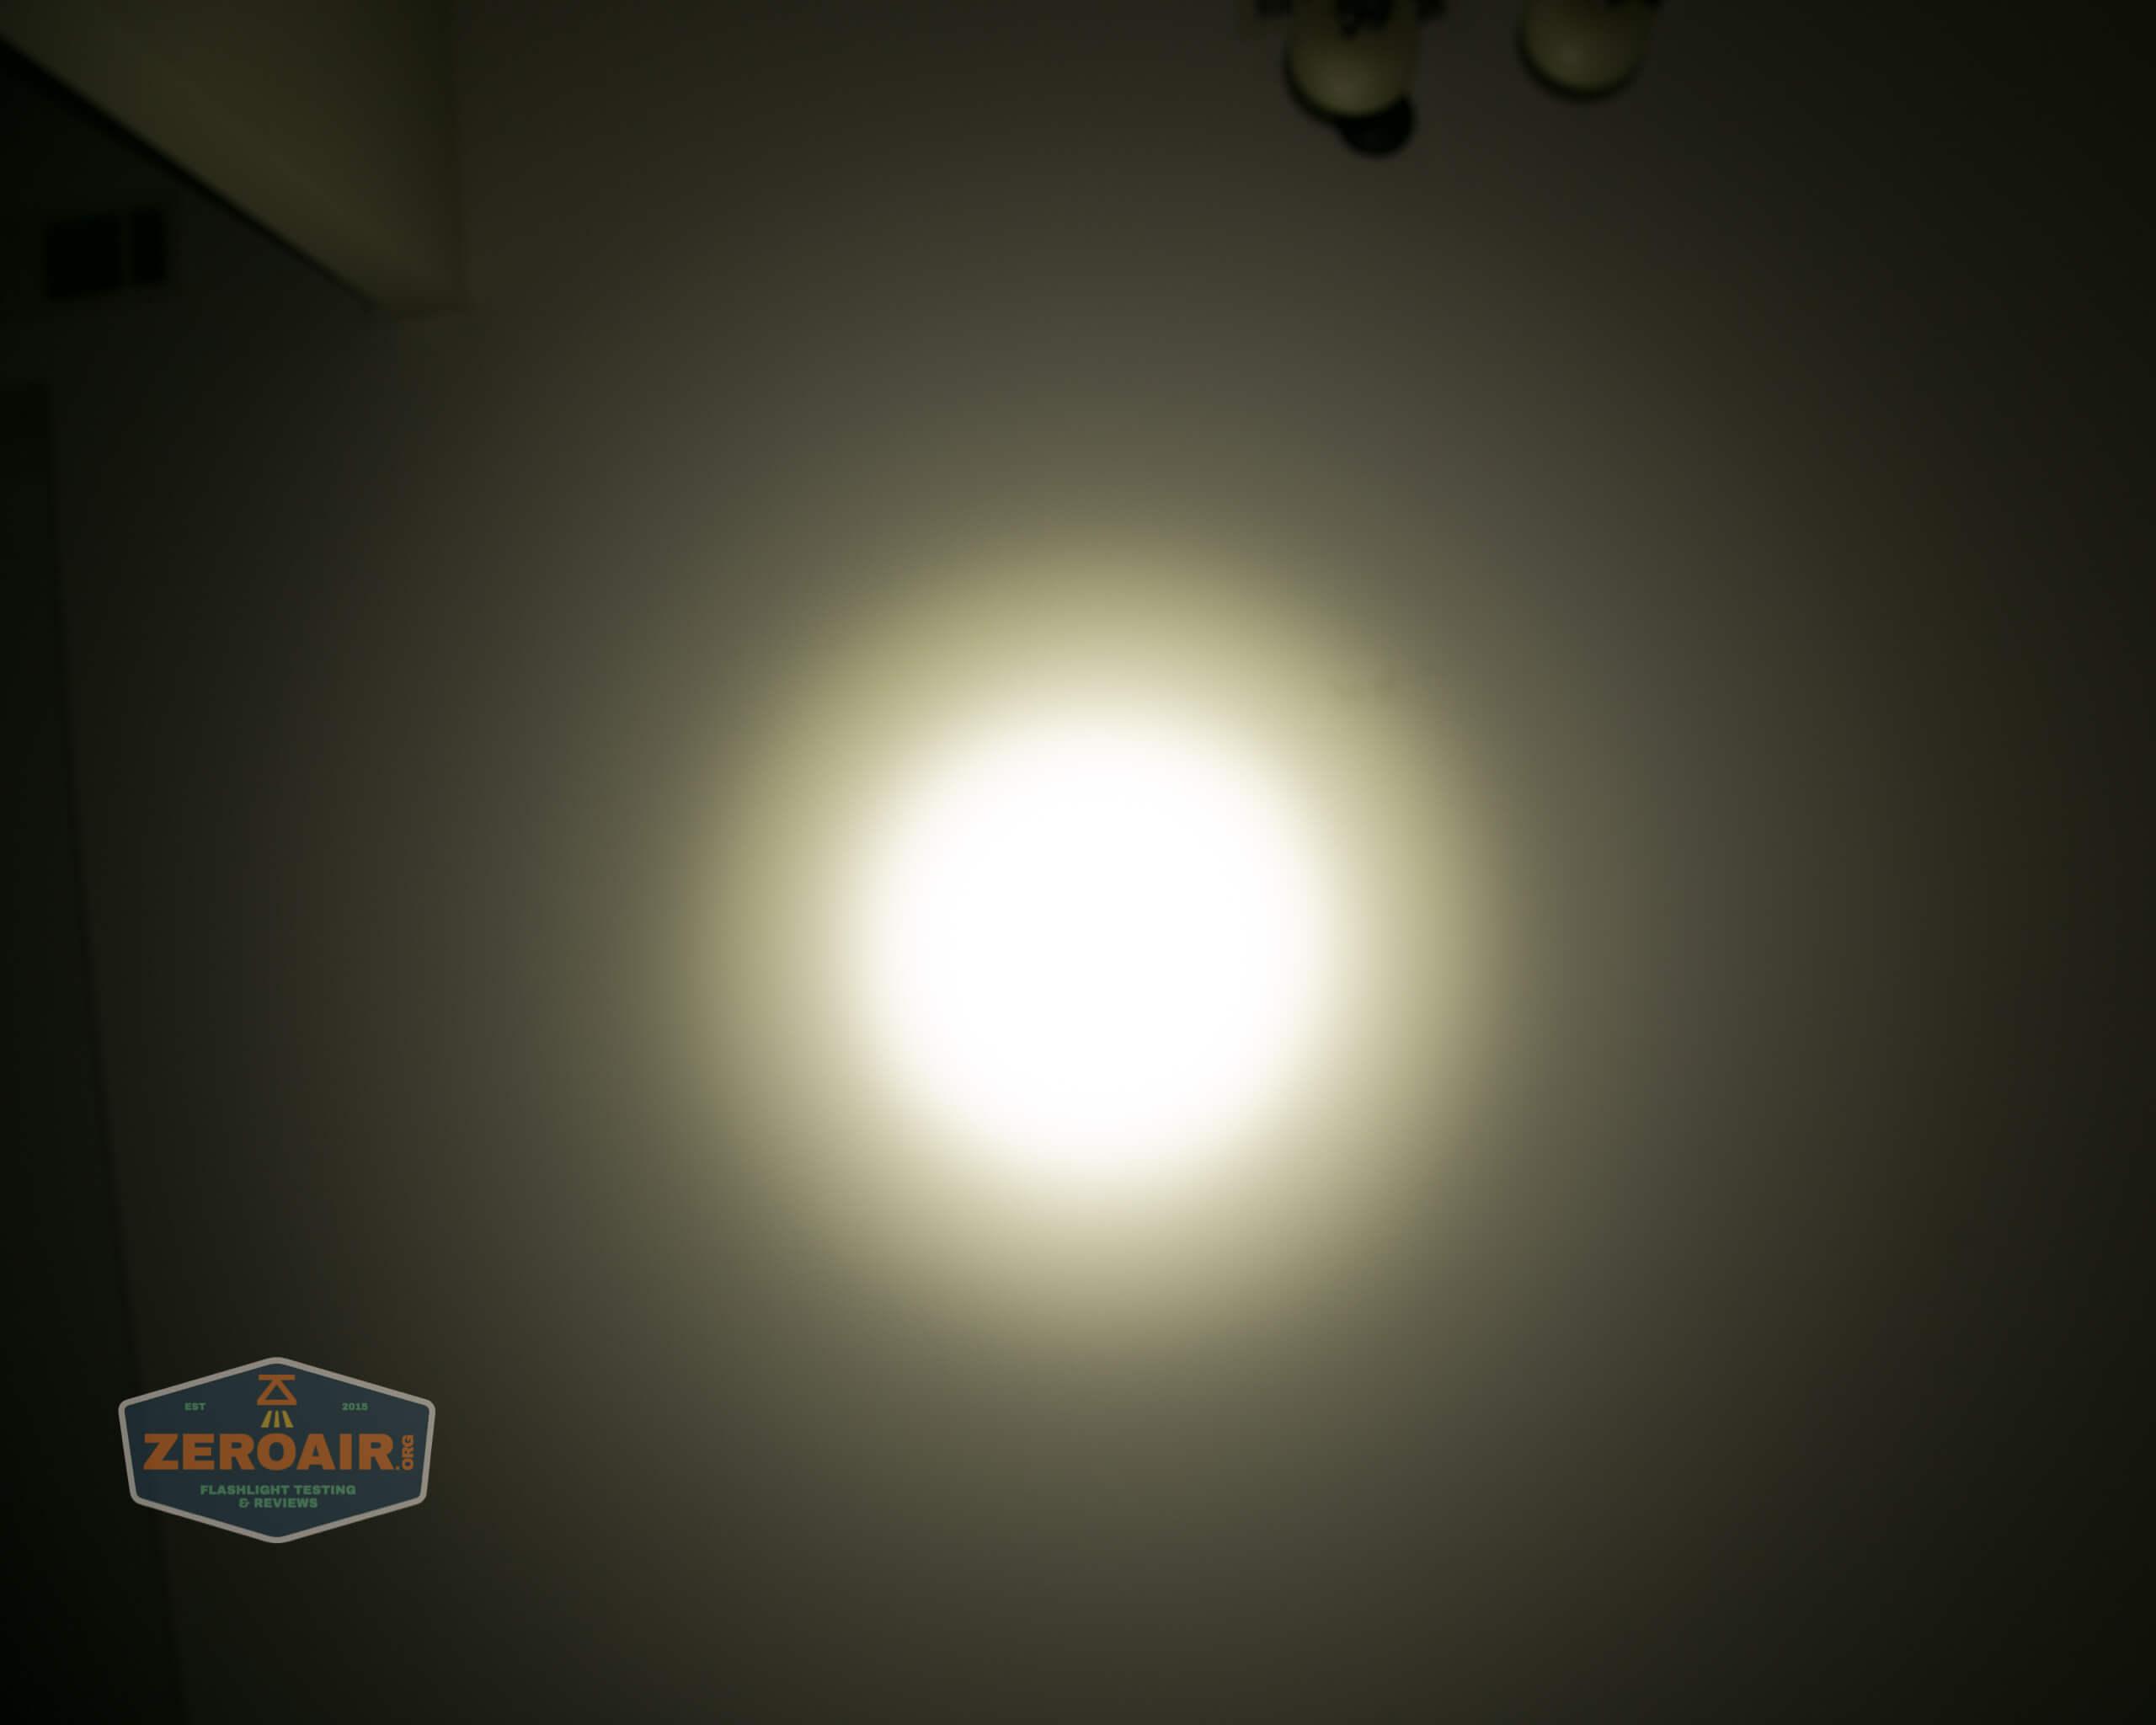 Olight m2r pro warrior beamshot ceiling 5